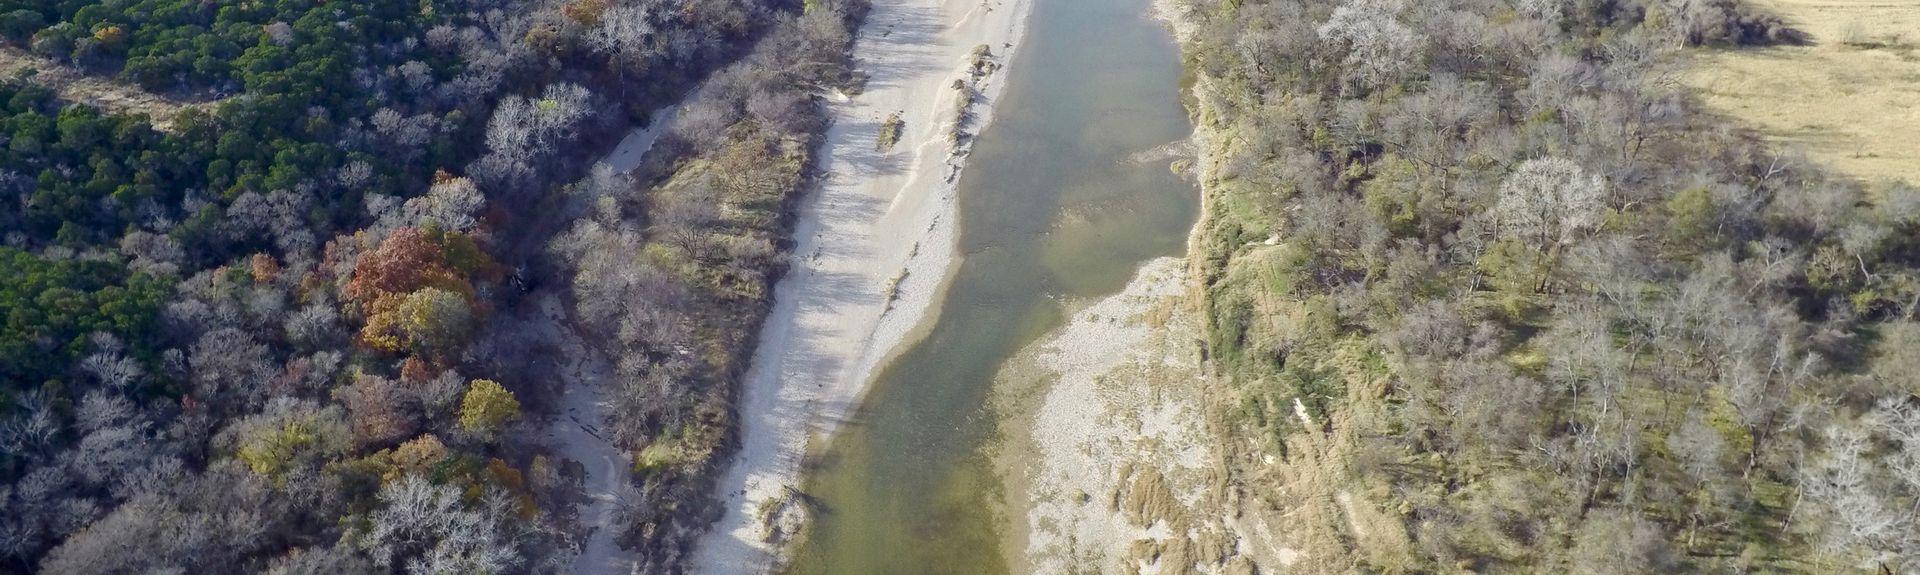 Cleburne Golf Links, Cleburne, Texas, United States